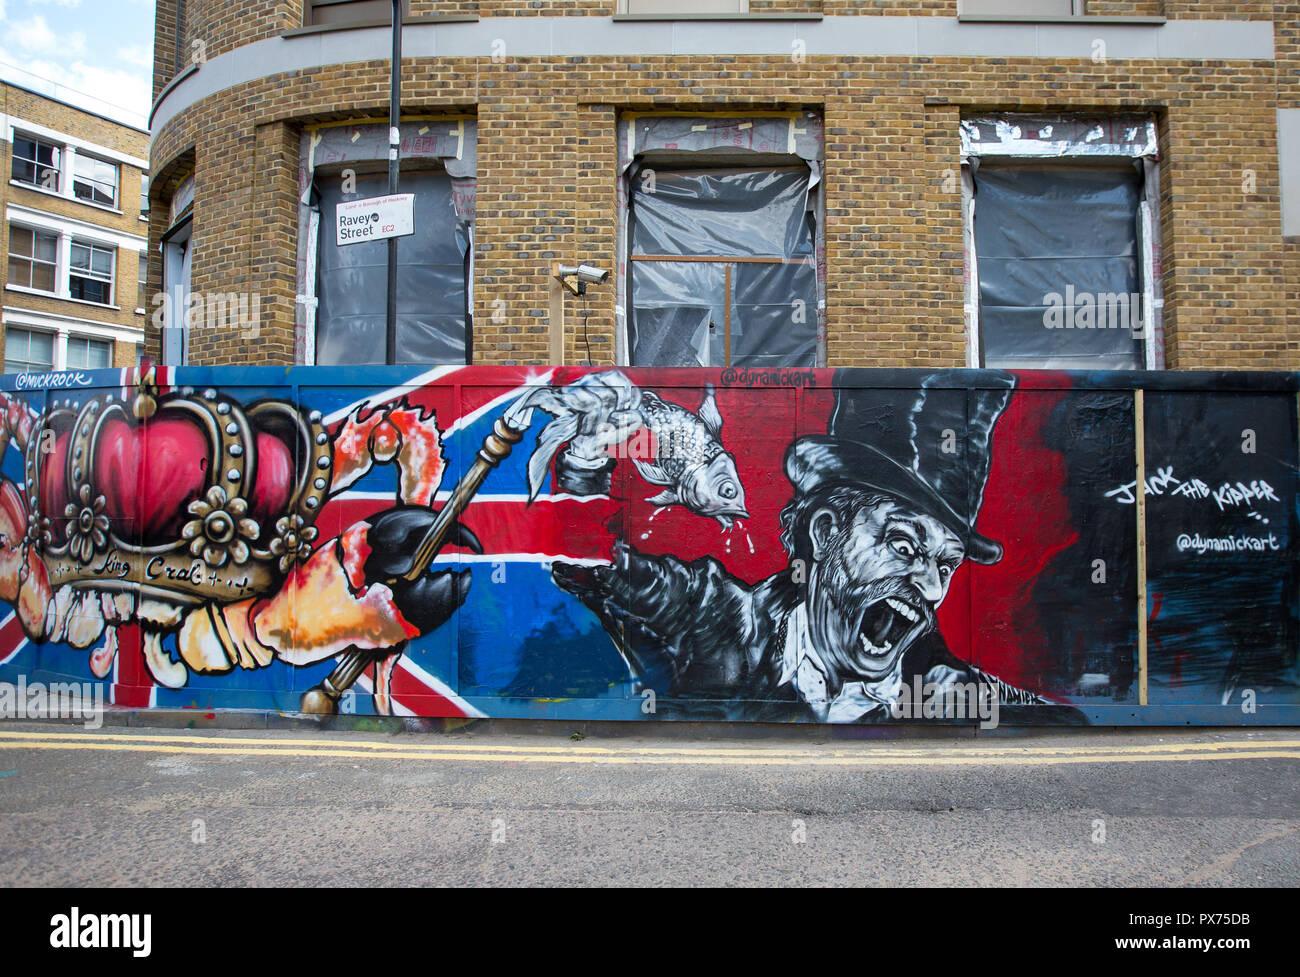 Il Jack Kipper artwork da Michael Batchelor (DynamicKart) & KingCrab artwork da Jules Muck (MuckRock) - Street Art London in ed intorno a Brick Lane / Foto Stock